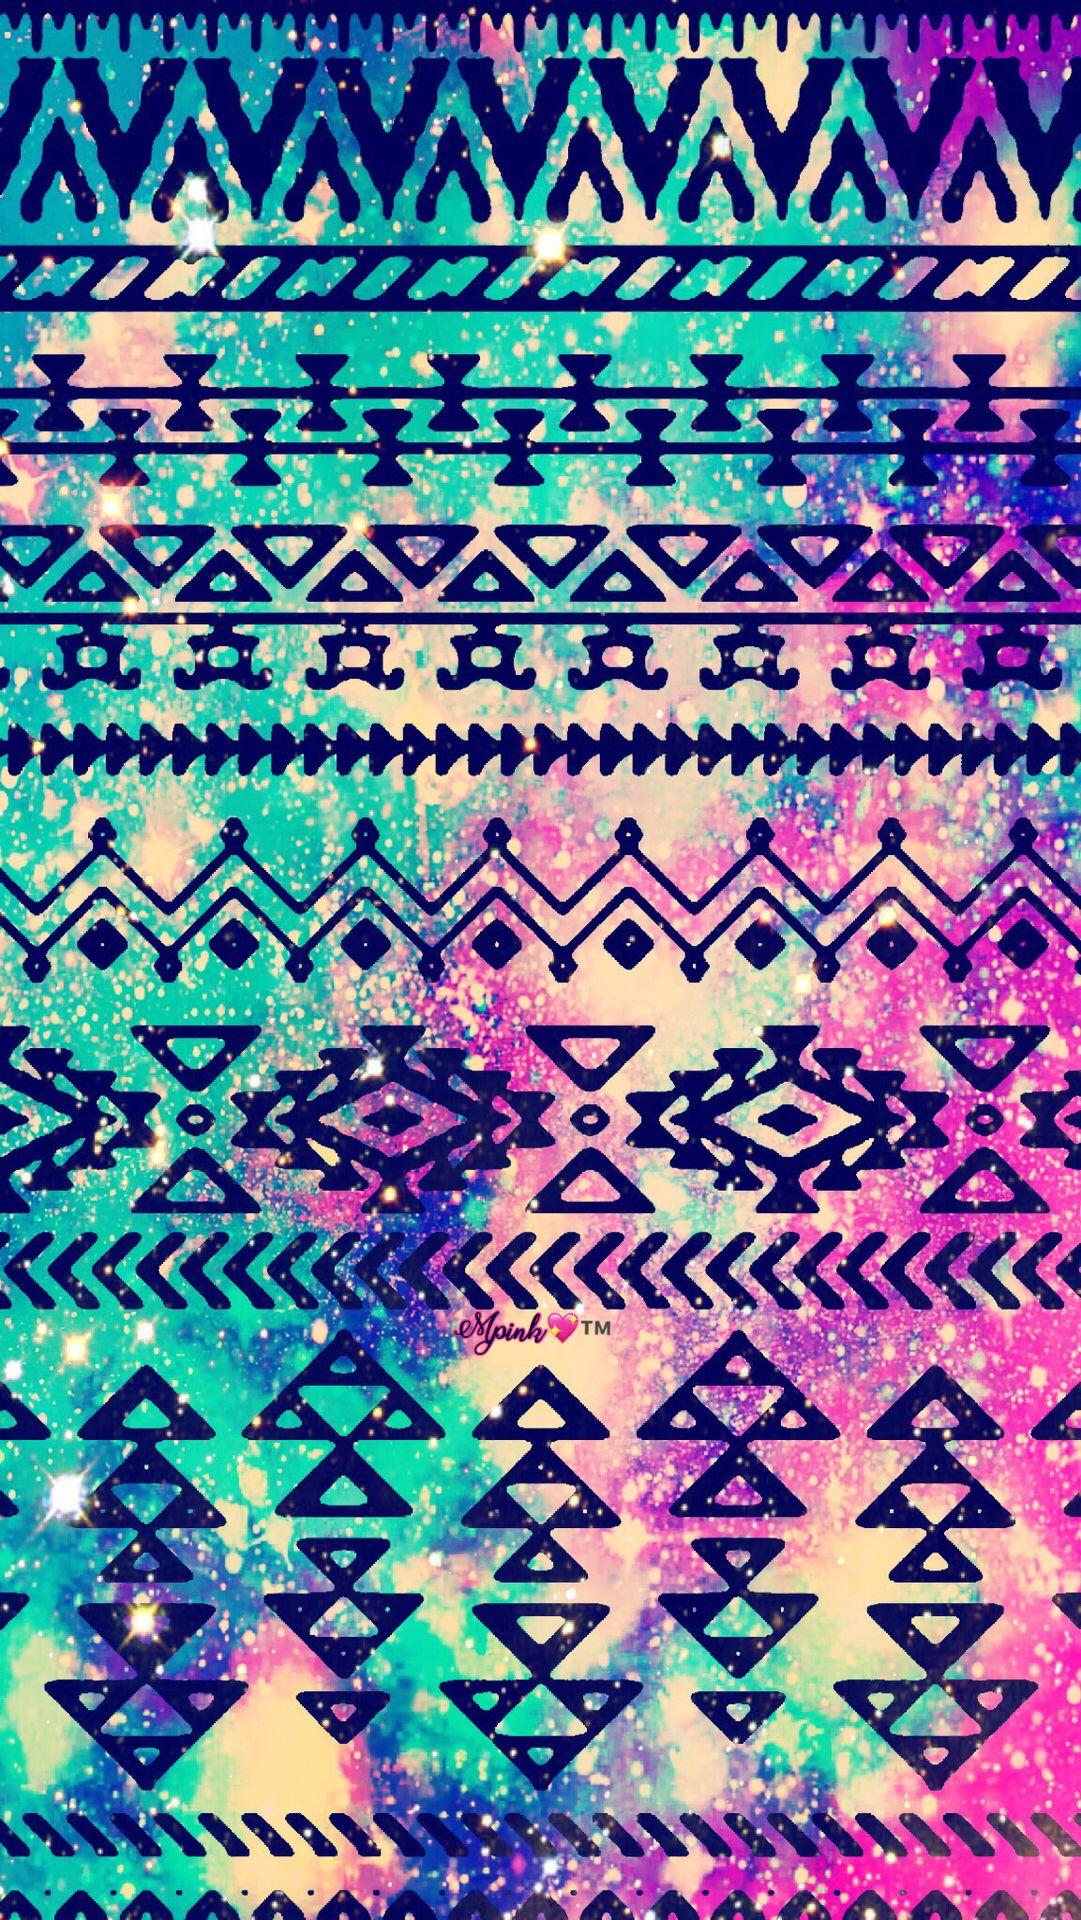 Grunge Tribal Pattern Galaxy Wallpaper Androidwallpaper Iphonewallpaper Wallpaper Galaxy Sparkle Gli Tribal Pattern Background Wallpaper Galaxy Wallpaper